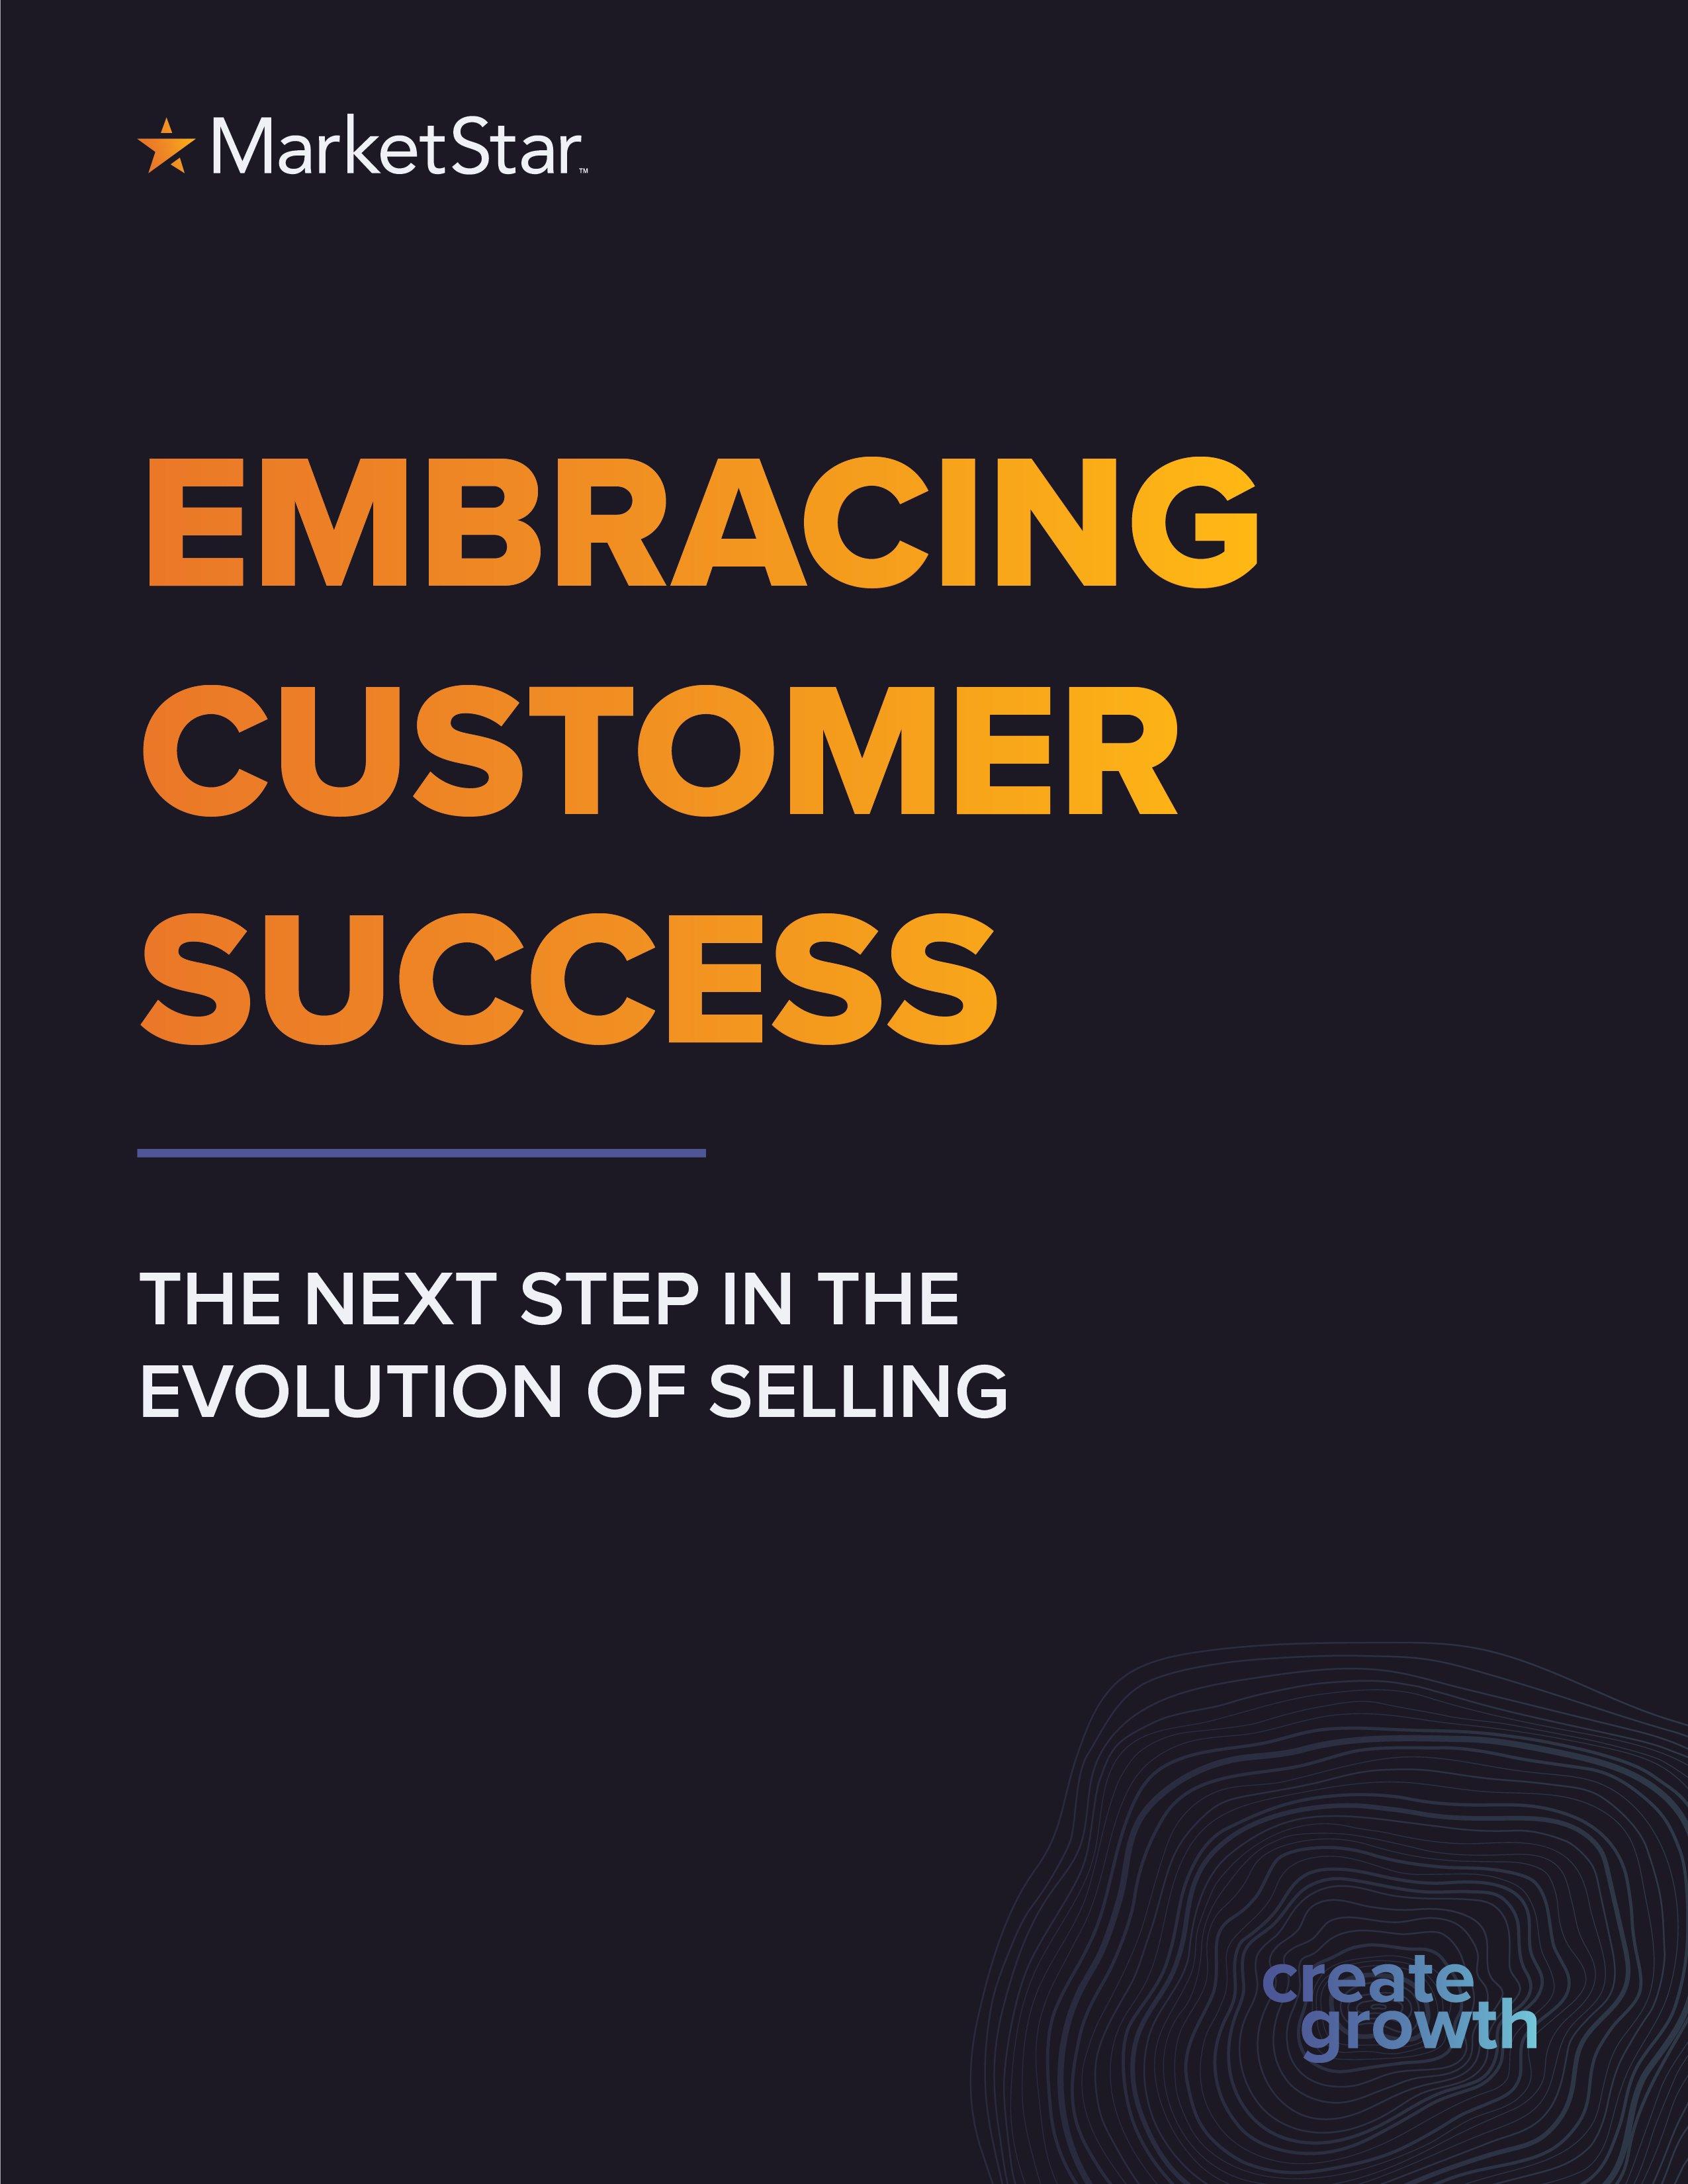 Embracing Customer Success Ebook Cover - MarketStar